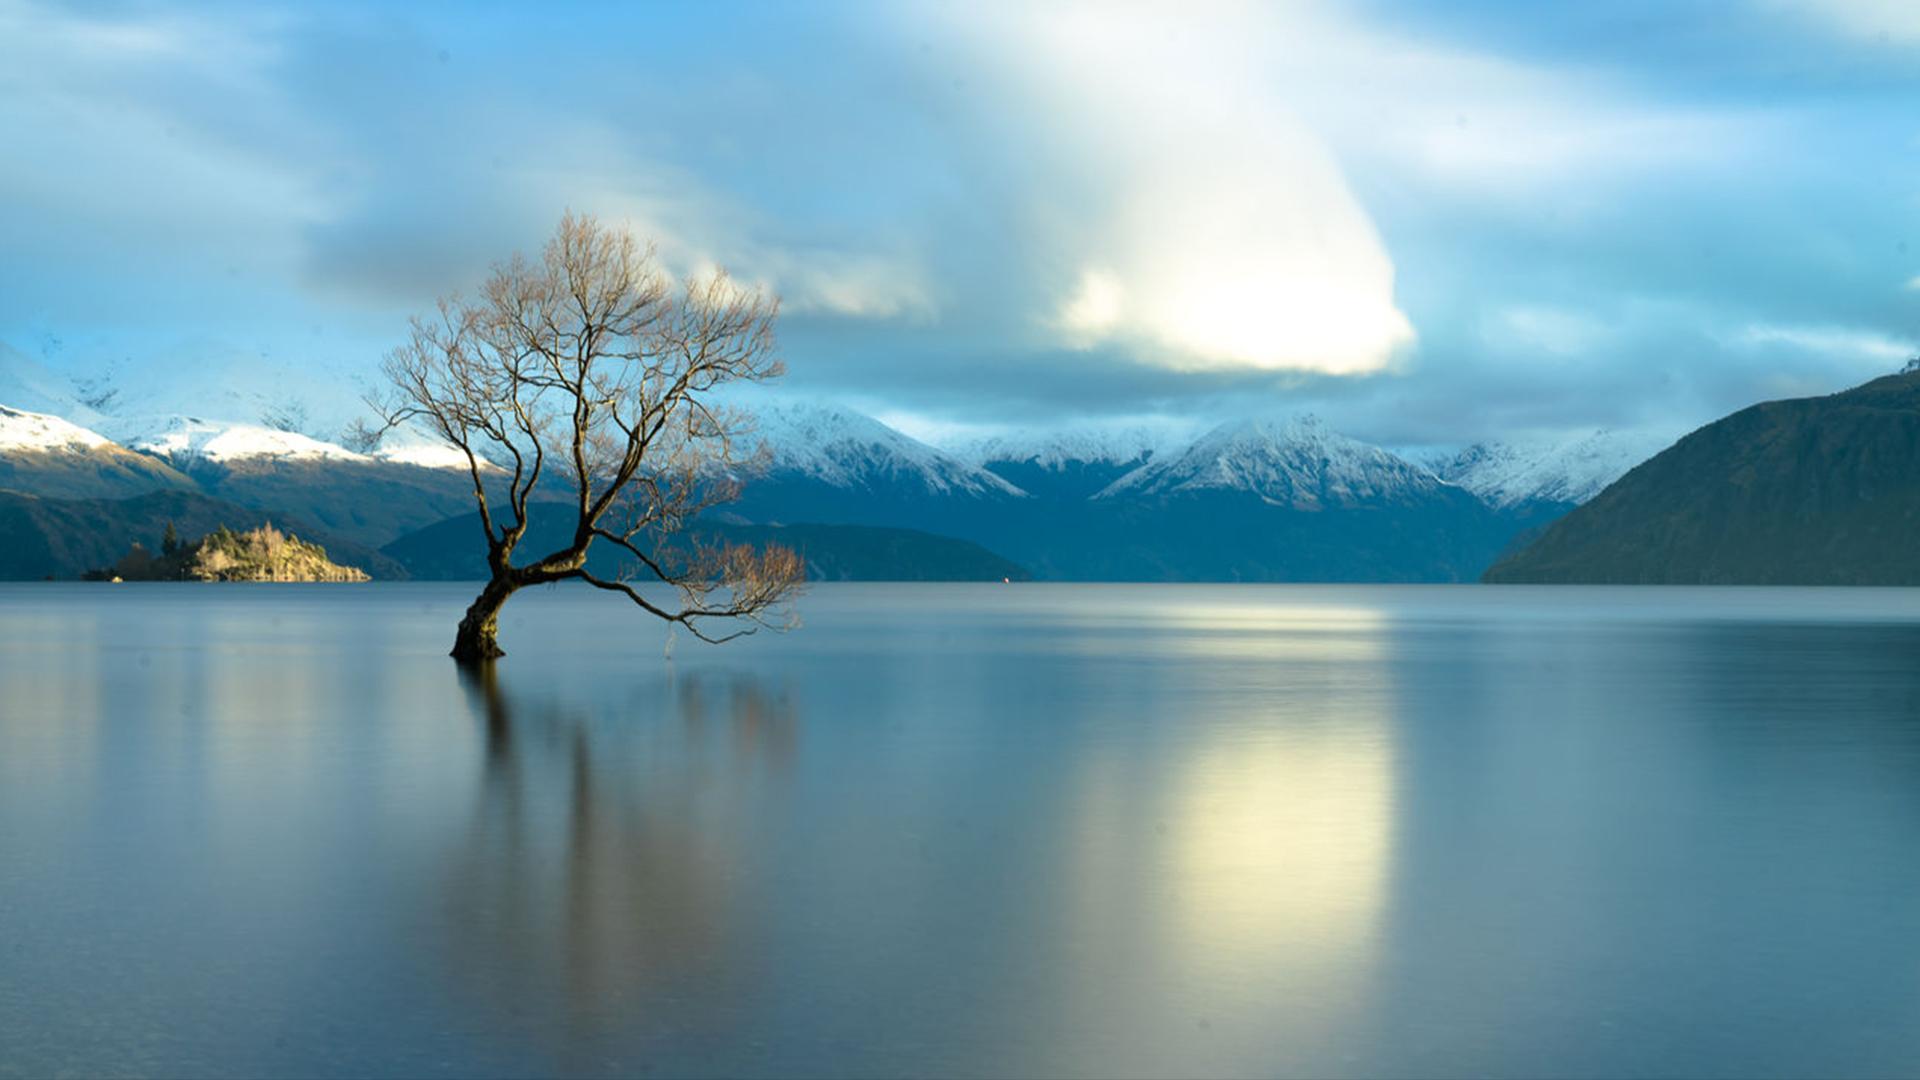 Famous lone tree on lake Wanaka, New Zealand | Windows 10 Spotlight Images